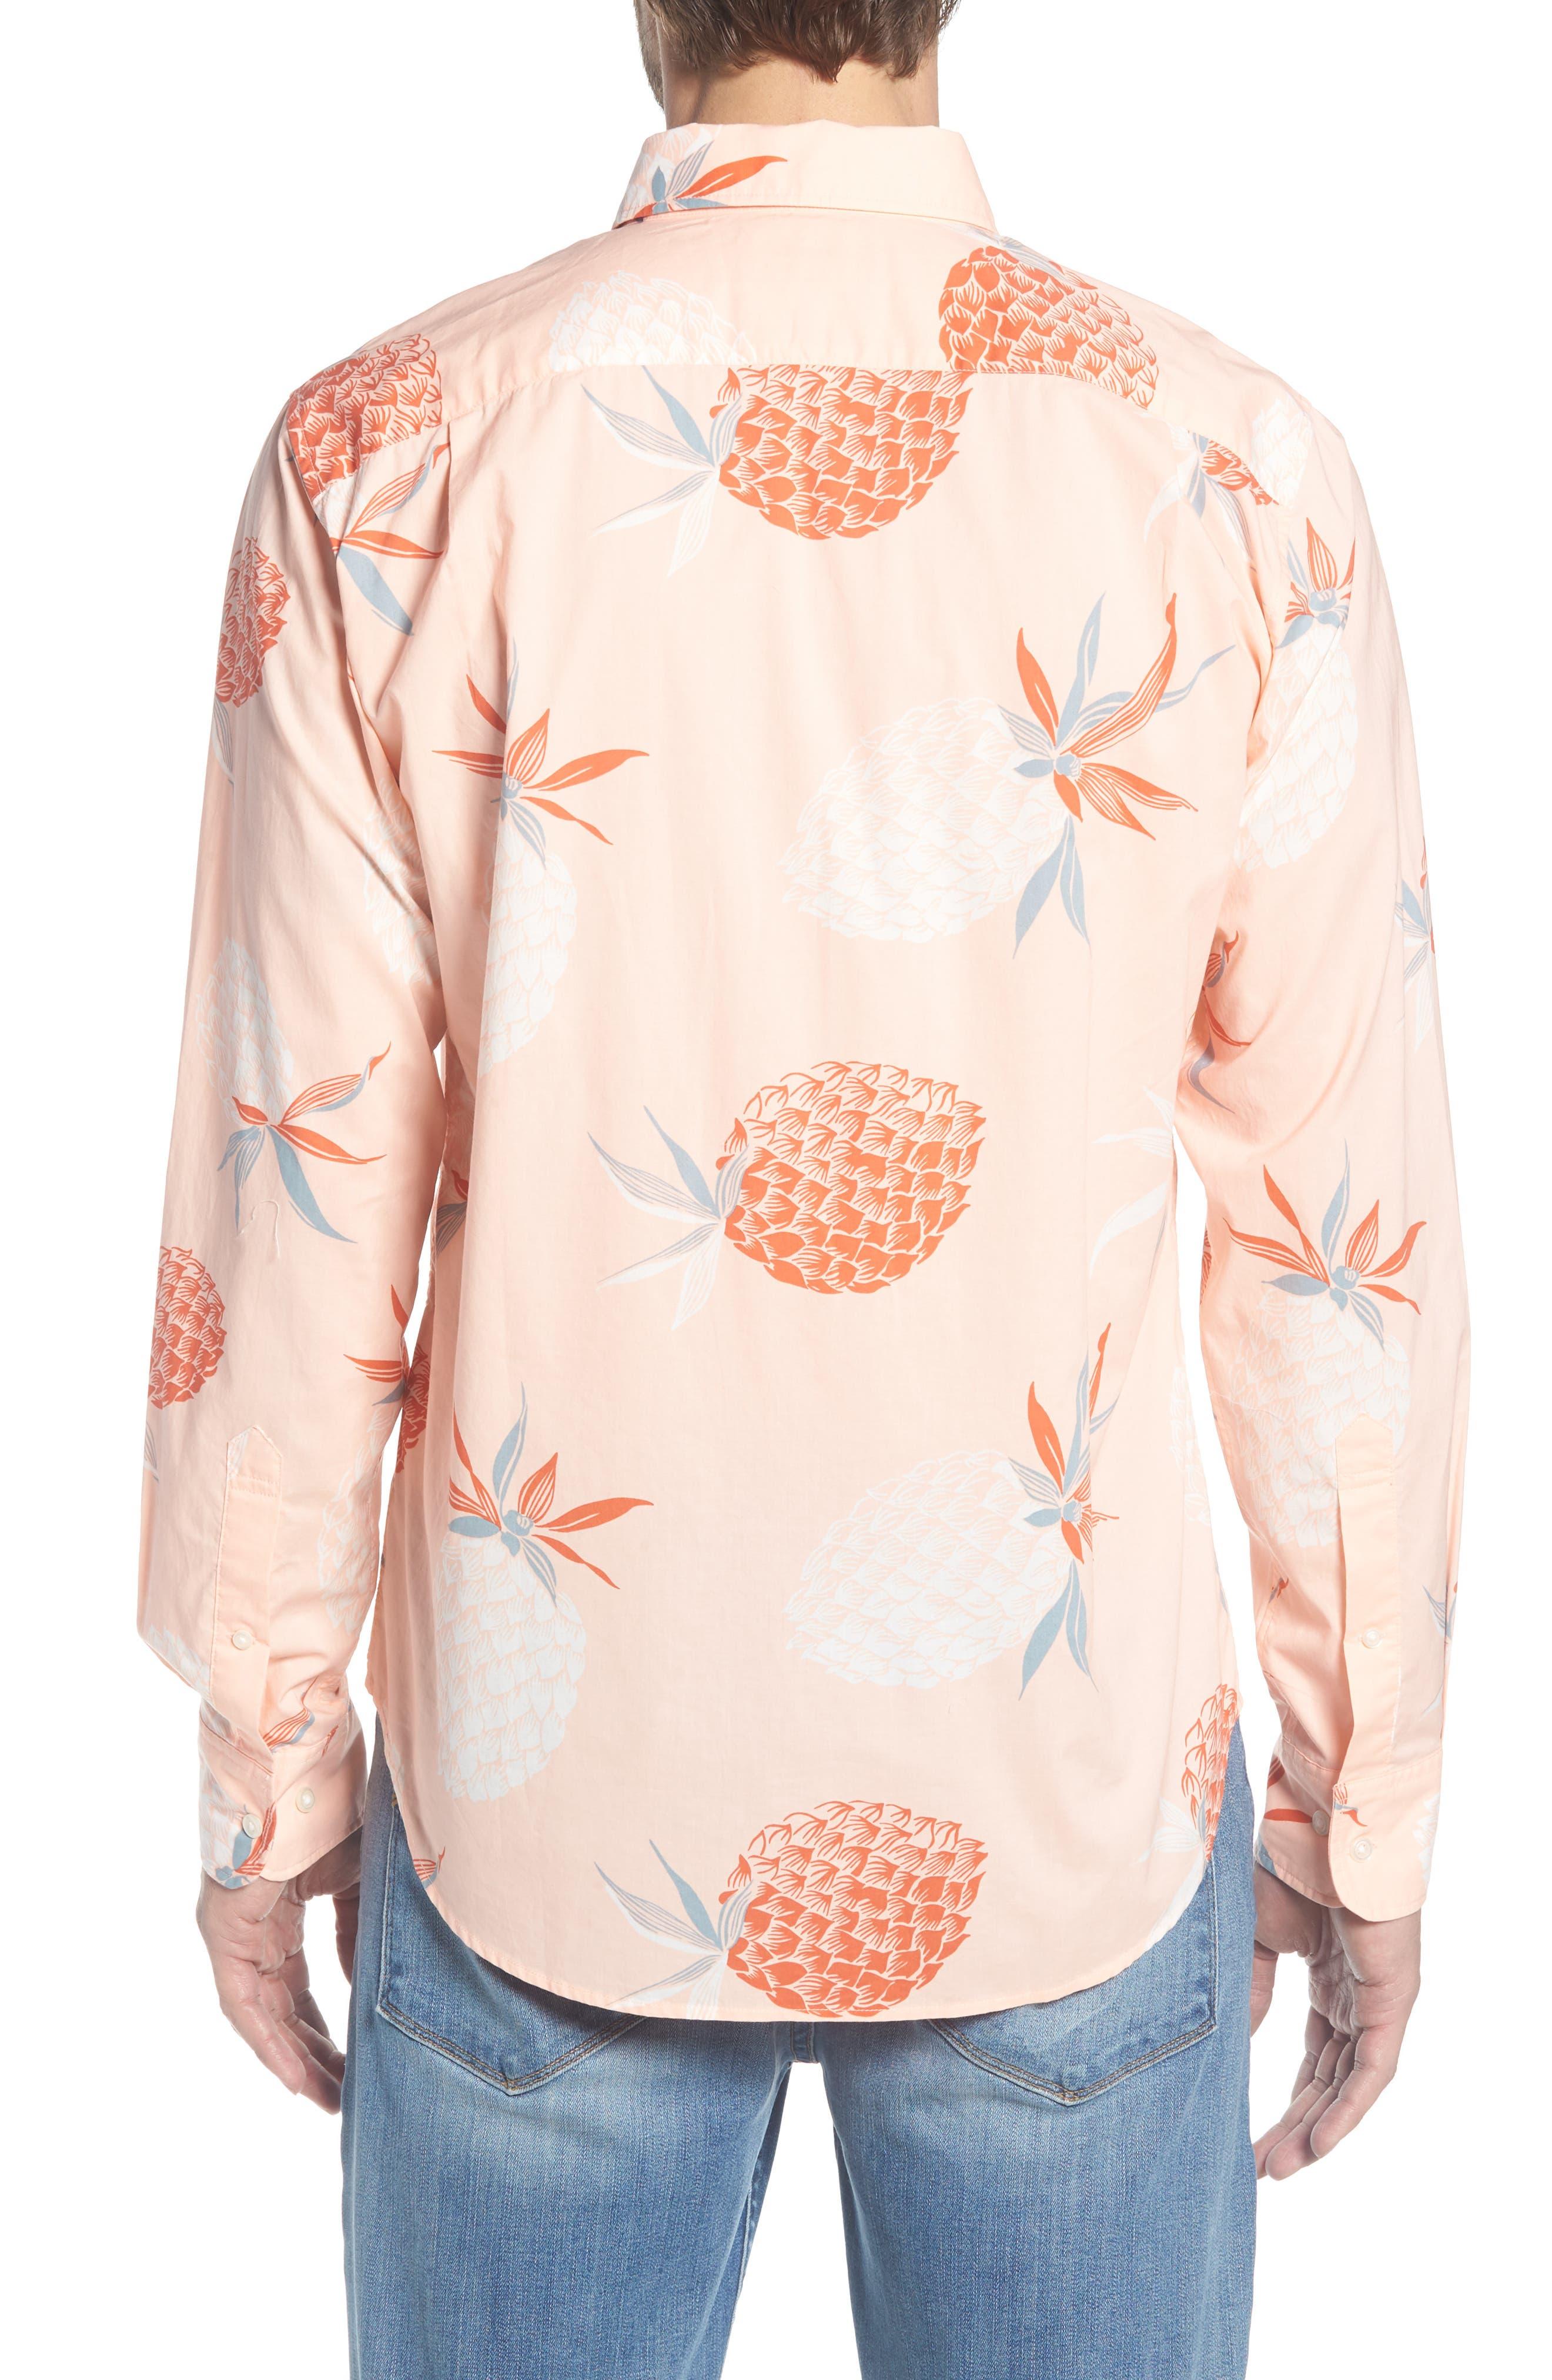 Summerweight Slim Fit Print Sport Shirt,                             Alternate thumbnail 3, color,                             Pineapple Party - Peach Melba